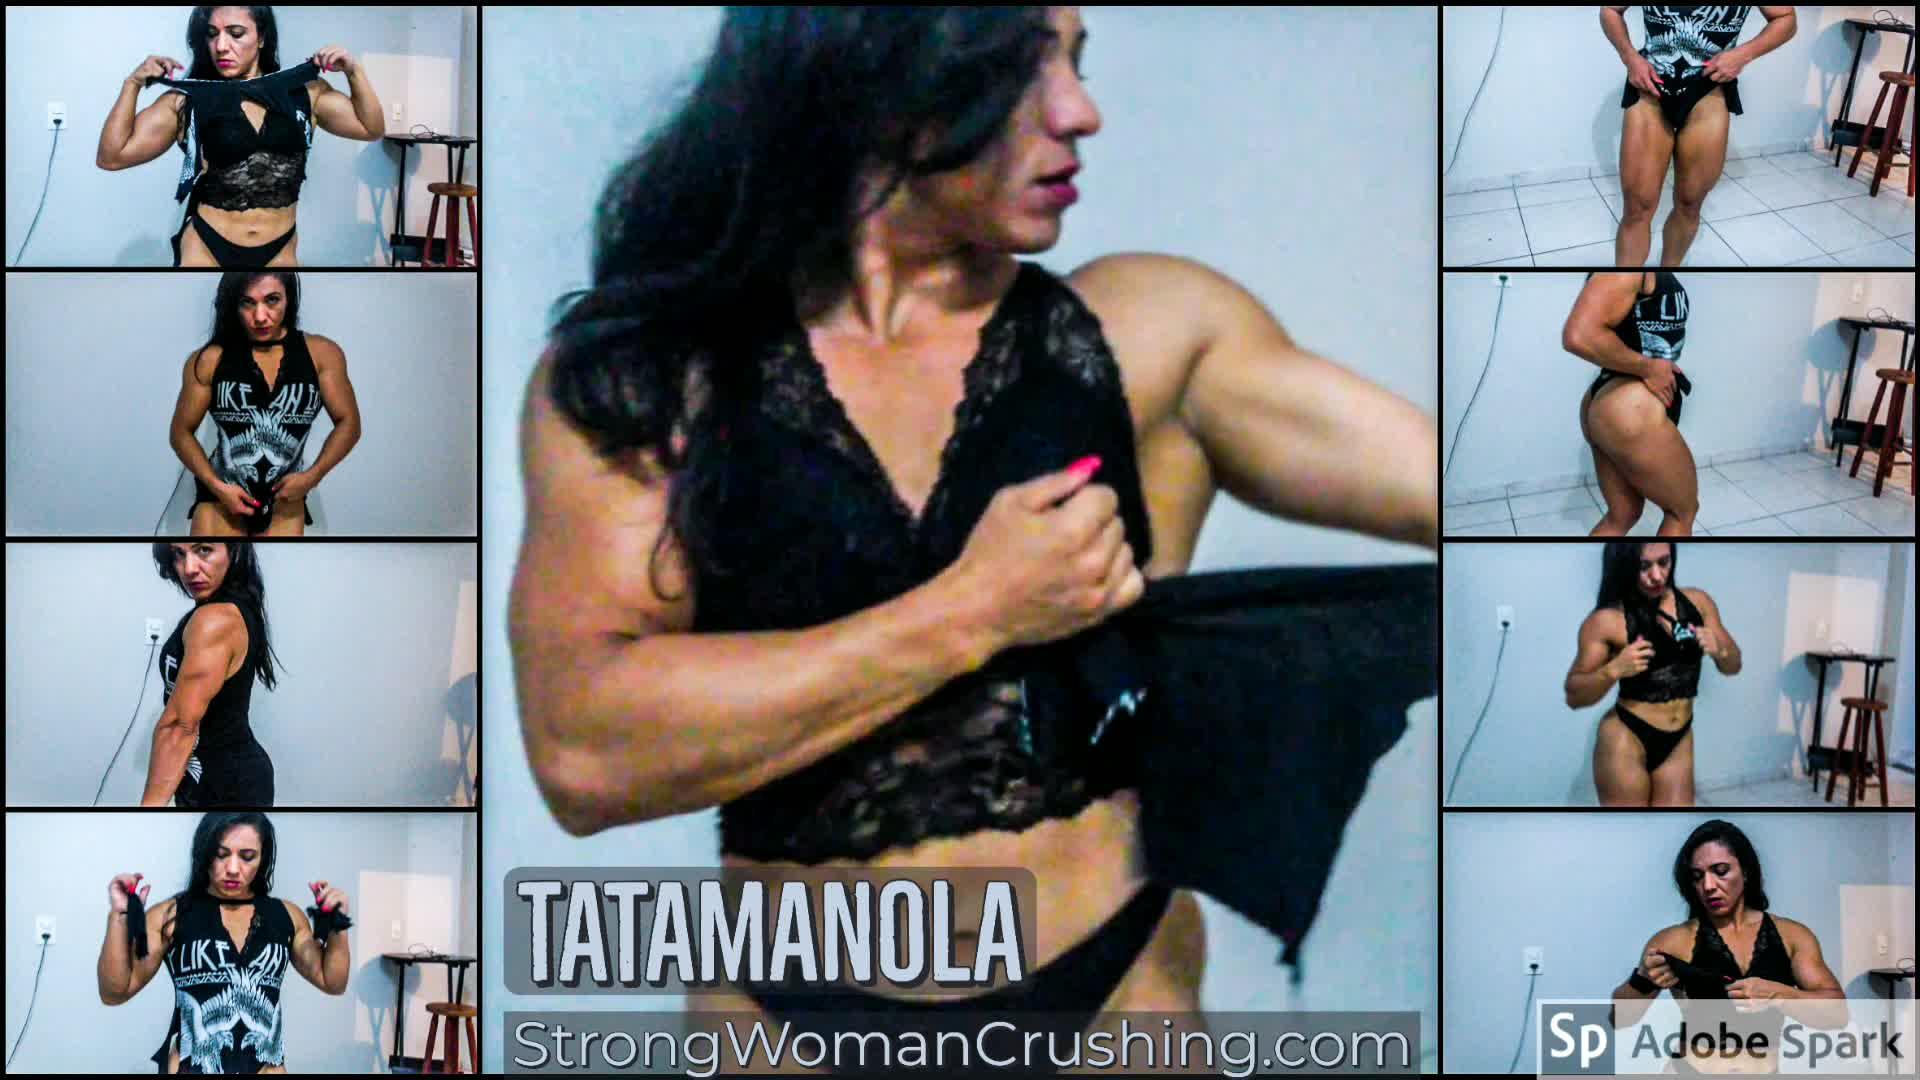 Tatamanola rips cloths